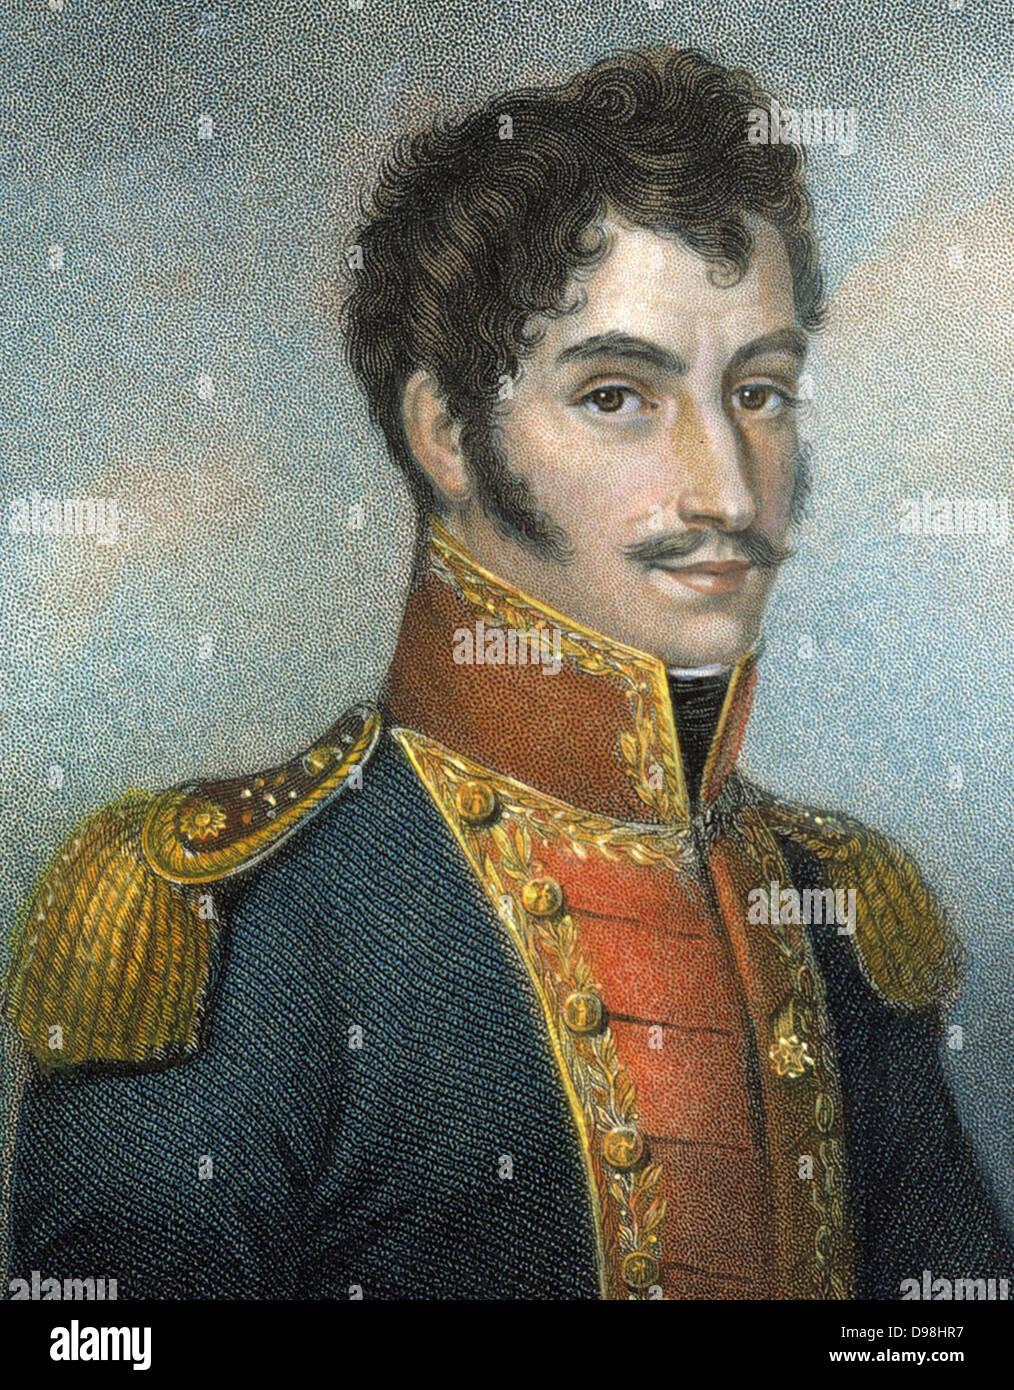 Simon Bolivar. 1783 - 1830, Venezuelan military and political leader. Together with José de San Martín, he played Stock Photo